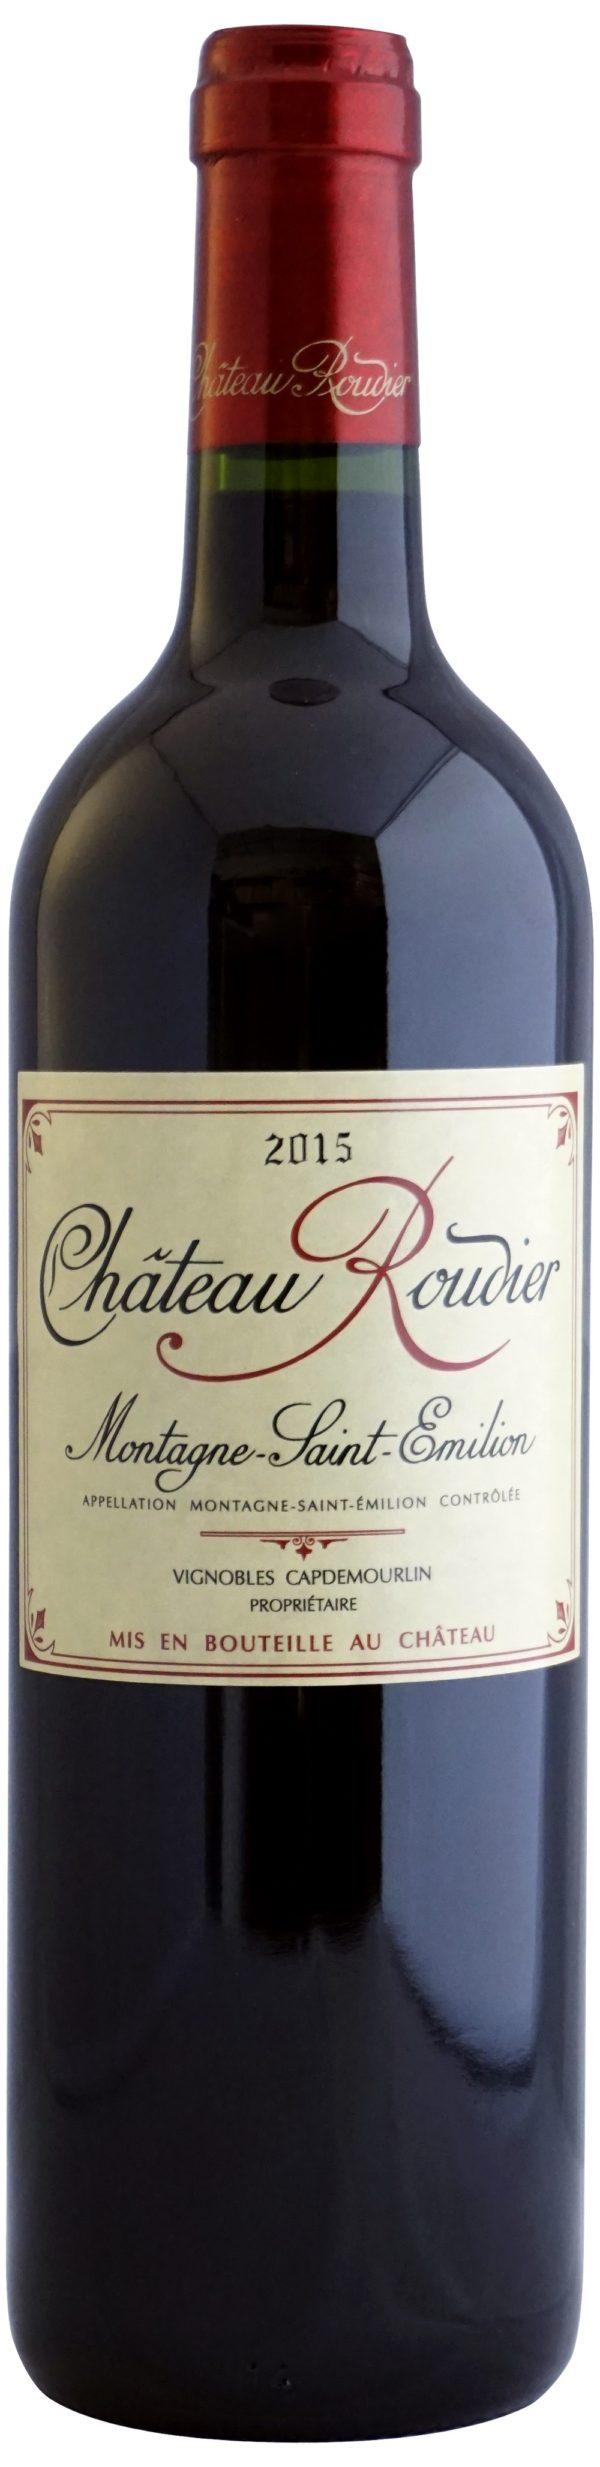 Château Roudier 2015